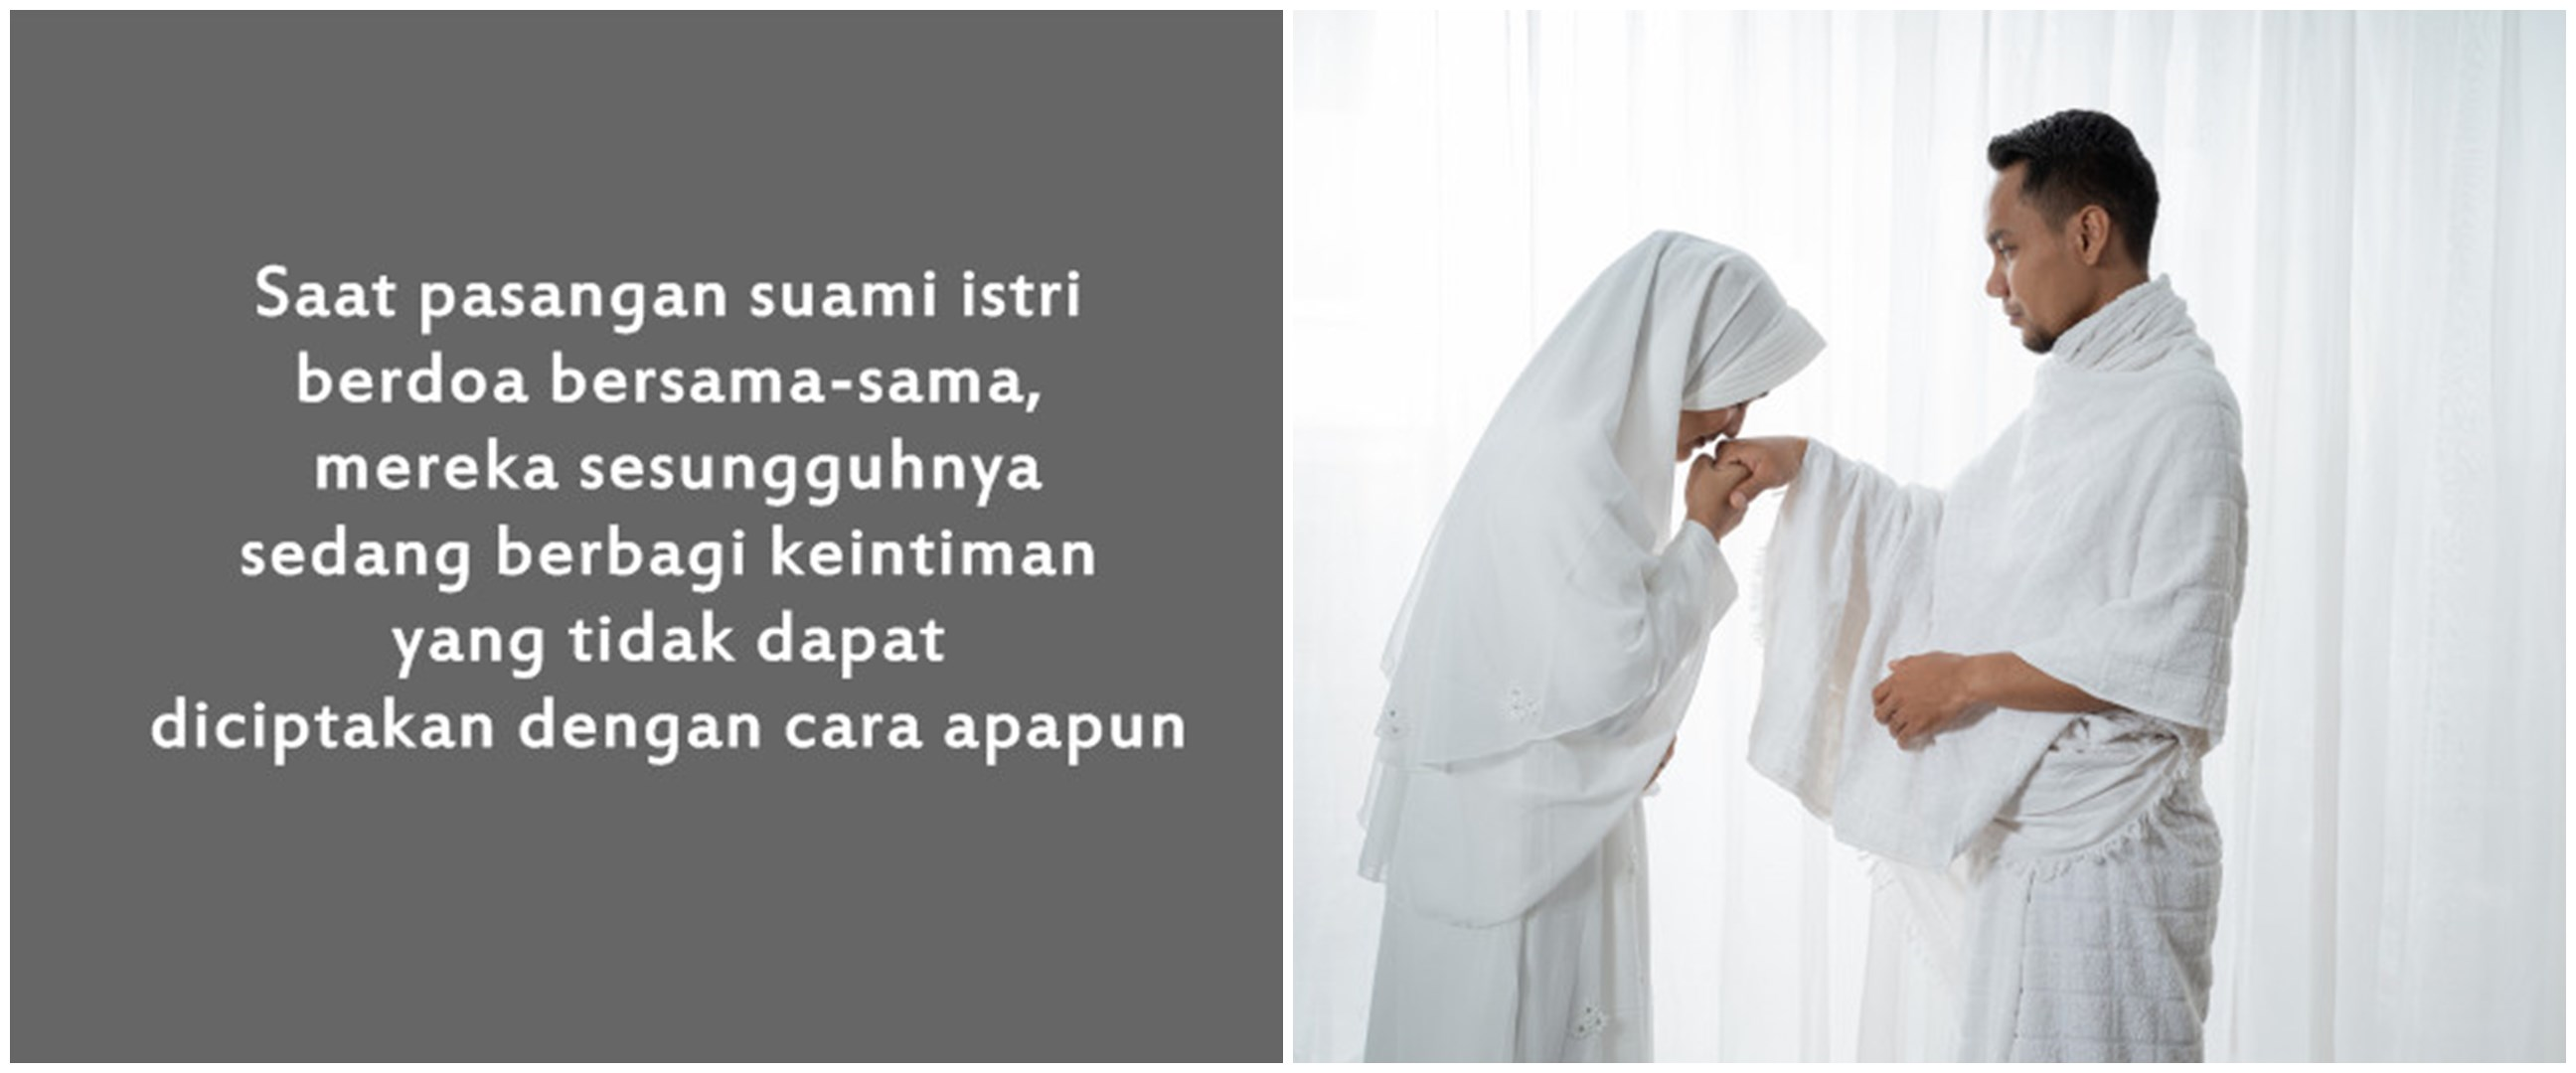 40 Kata-kata mutiara Islami untuk pasangan suami istri, penuh makna